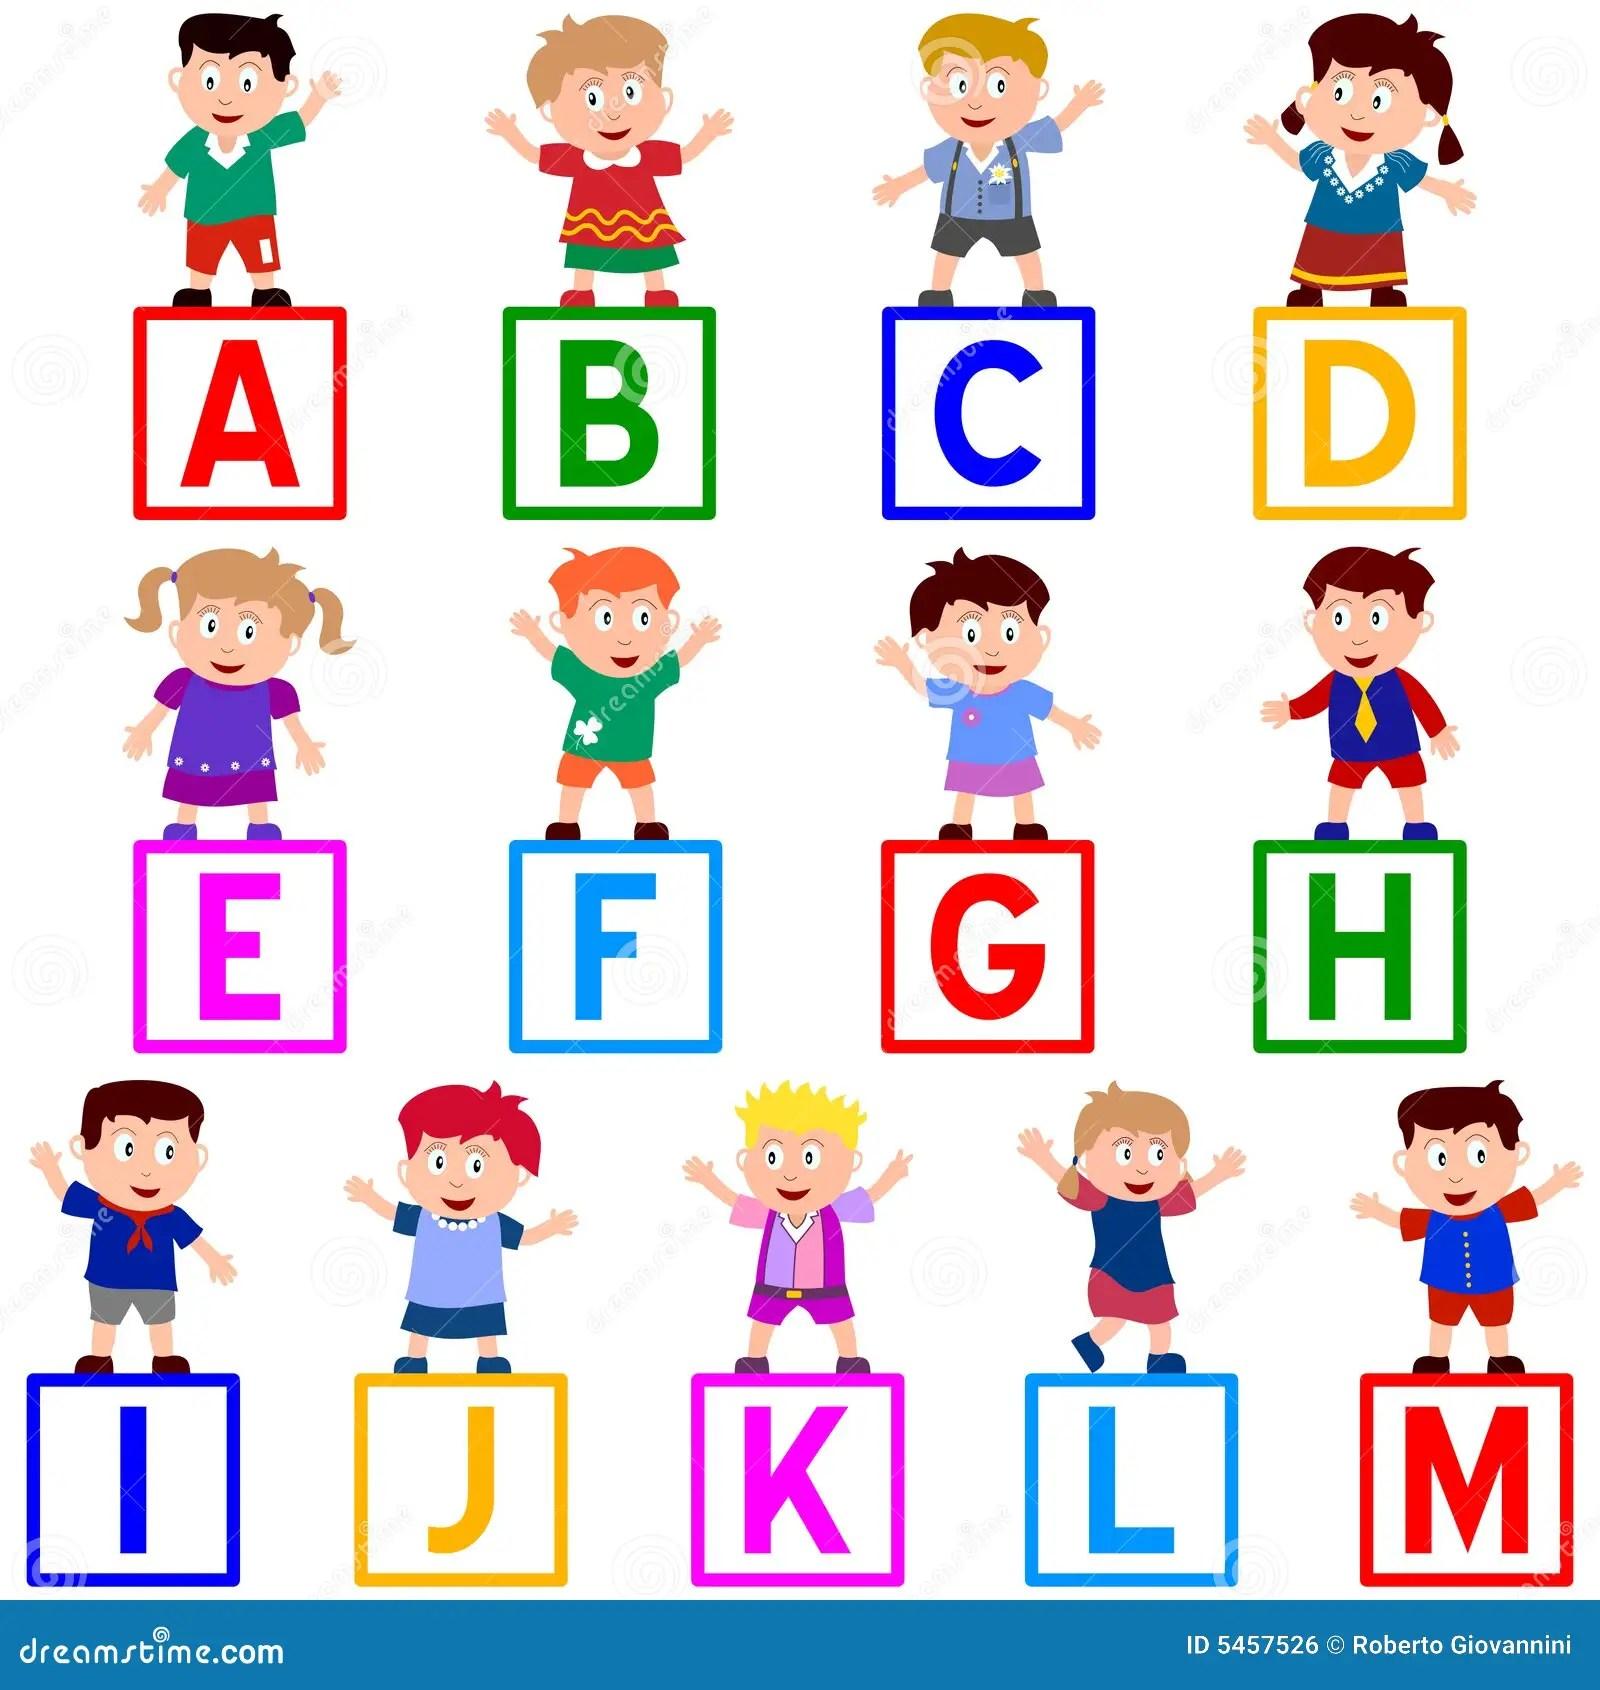 Kids Amp Blocks A M Stock Vector Illustration Of Cute